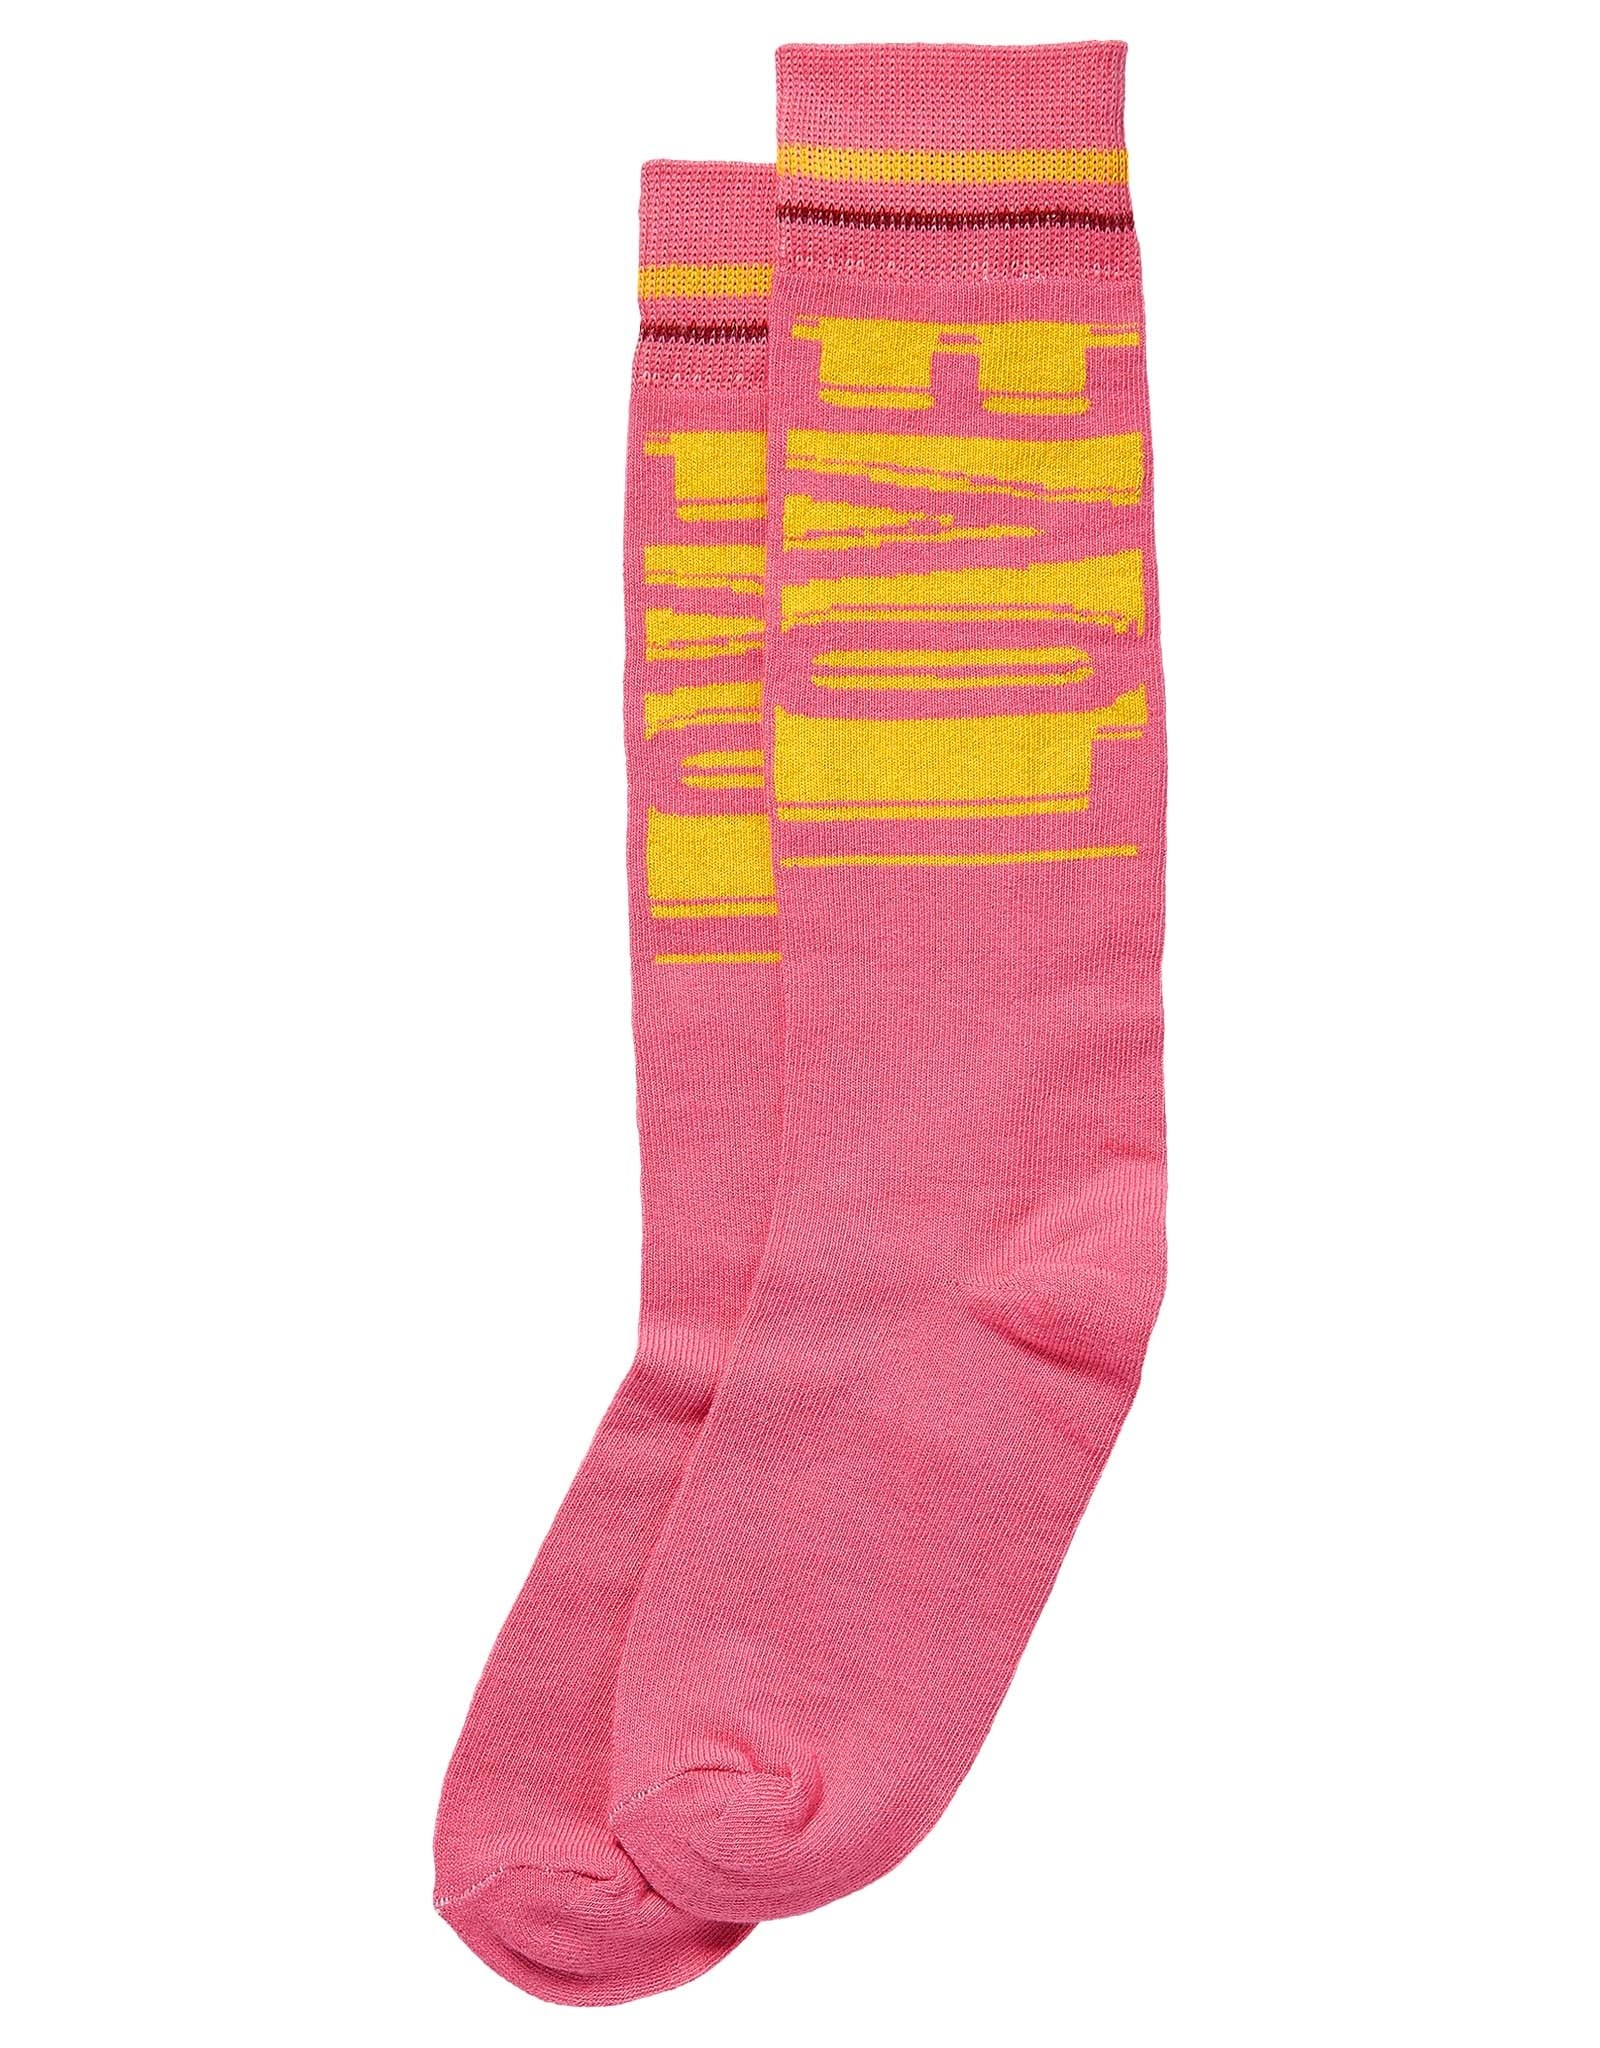 Quapi Quapi kneesocks Kyla pink Candy